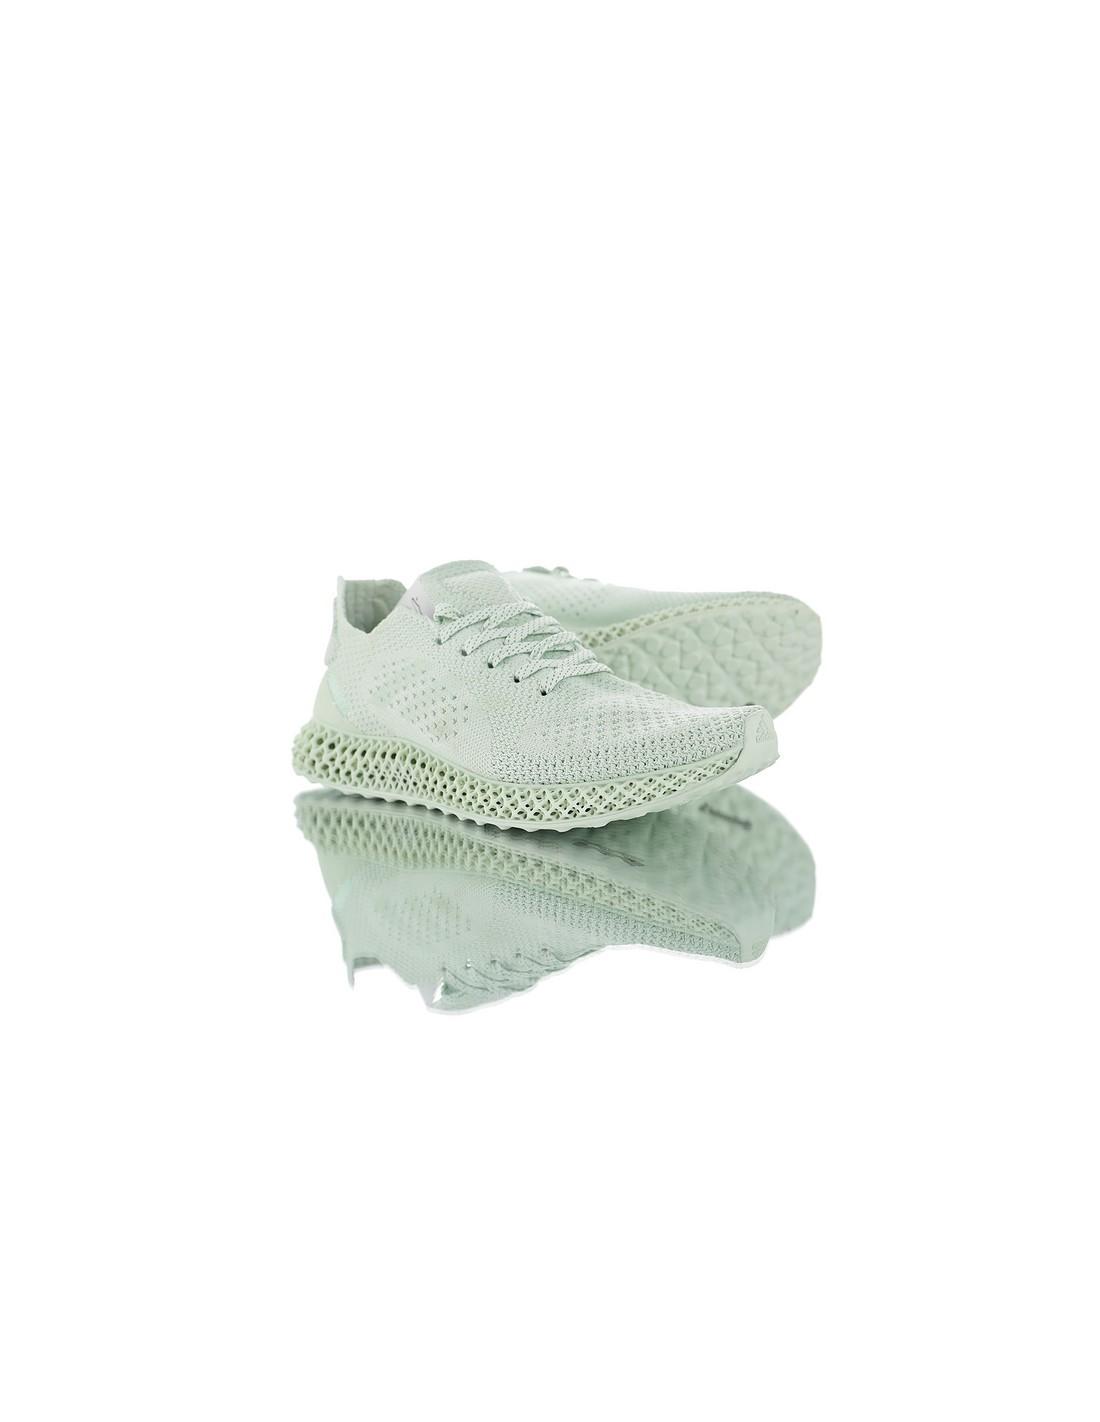 premium selection 510e4 5f0f1 Adidas FutureCraft 4D x Daniel Arsham Men's Shoe